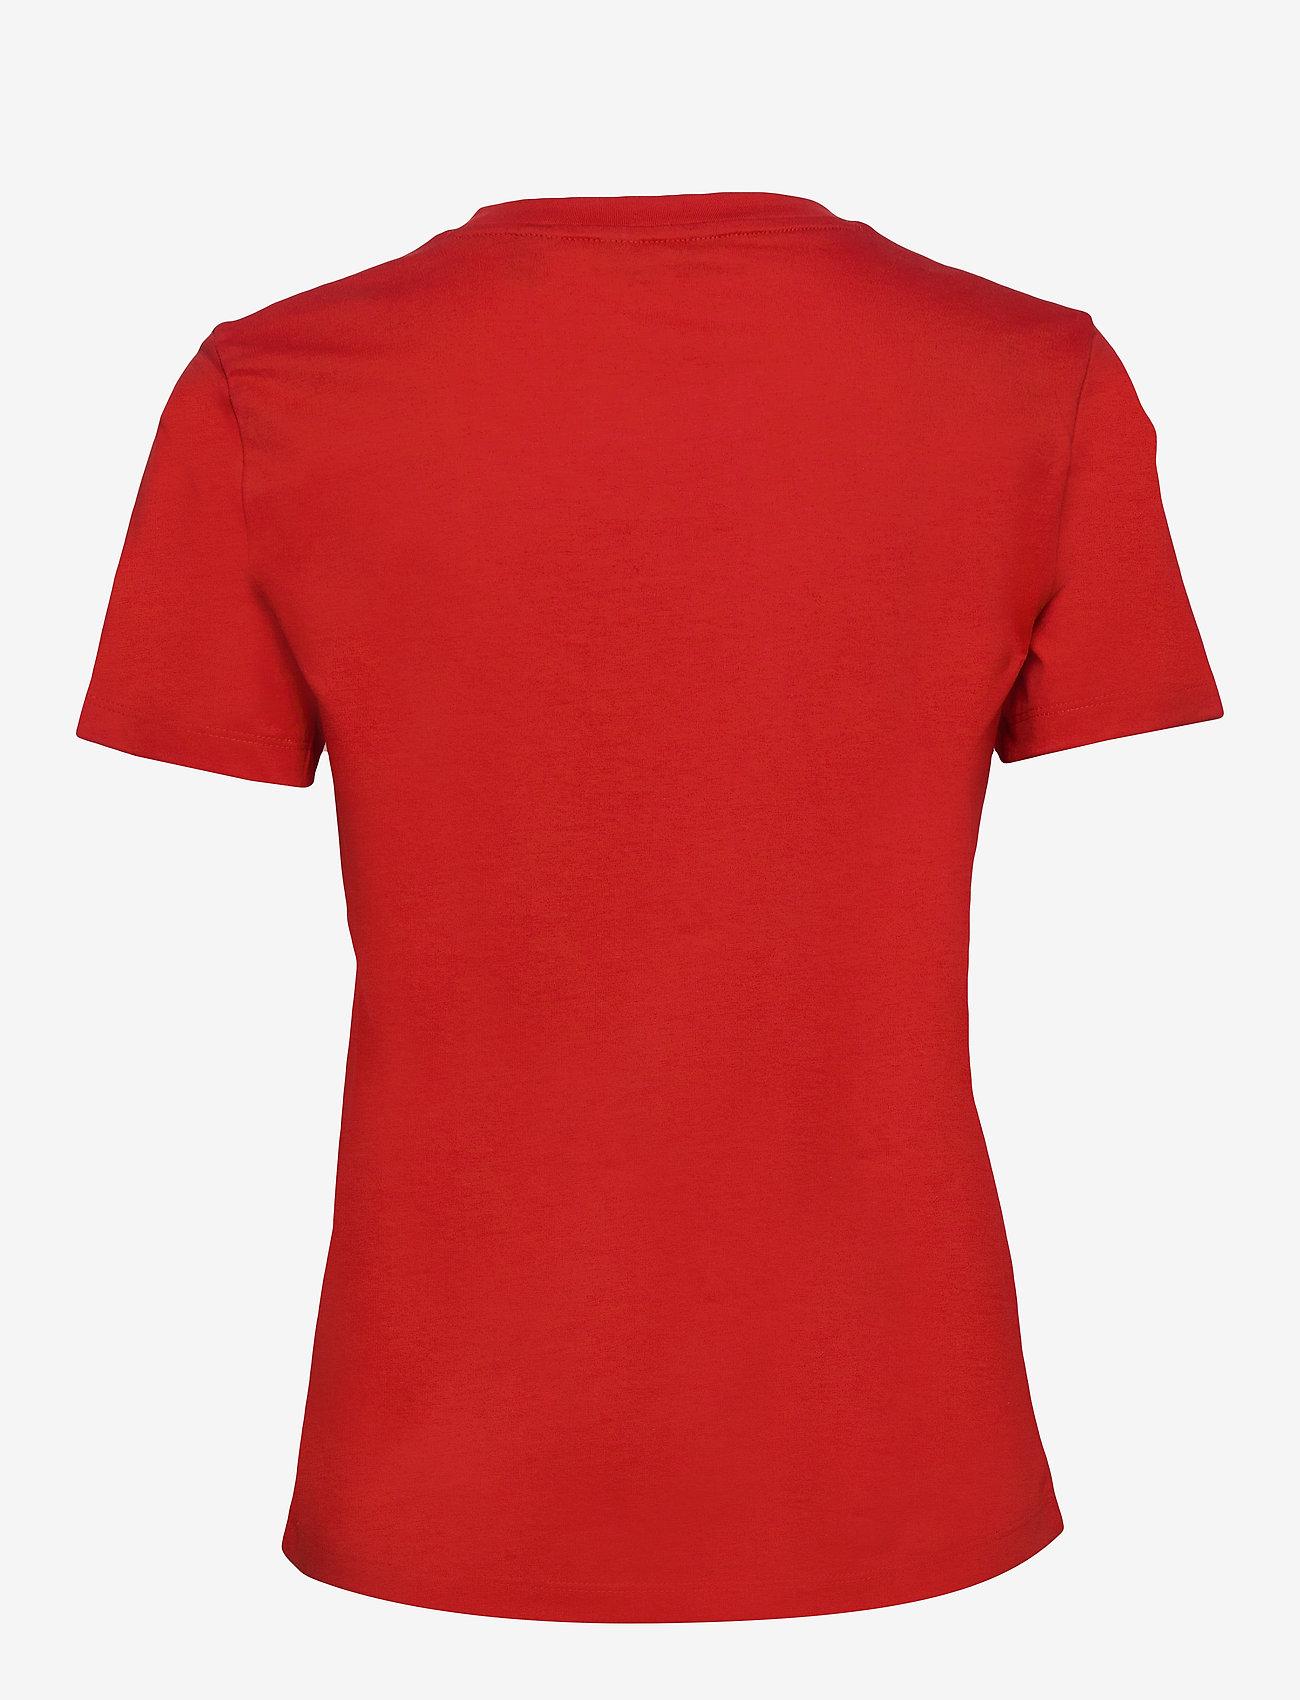 GANT - D1. 13 STRIPES SS T-SHIRT - t-shirts - fiery red - 1